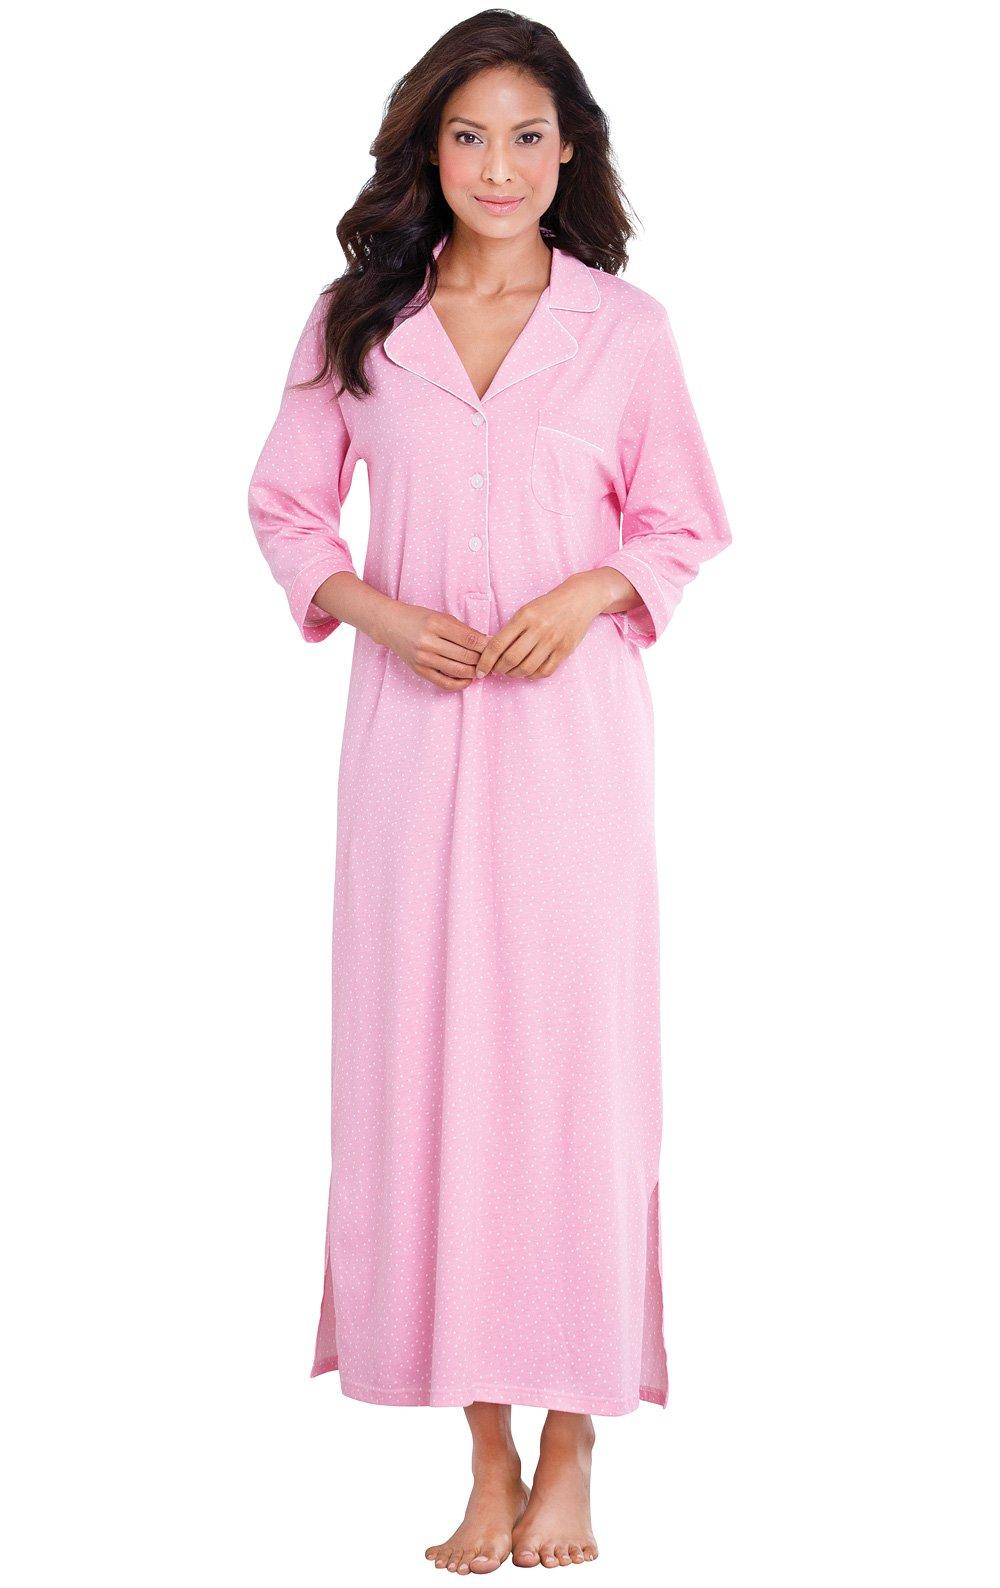 PajamaGram Plus Size Women's Soft Cotton Pin Dot Nightgown, Pink, 3X (24-26) by PajamaGram